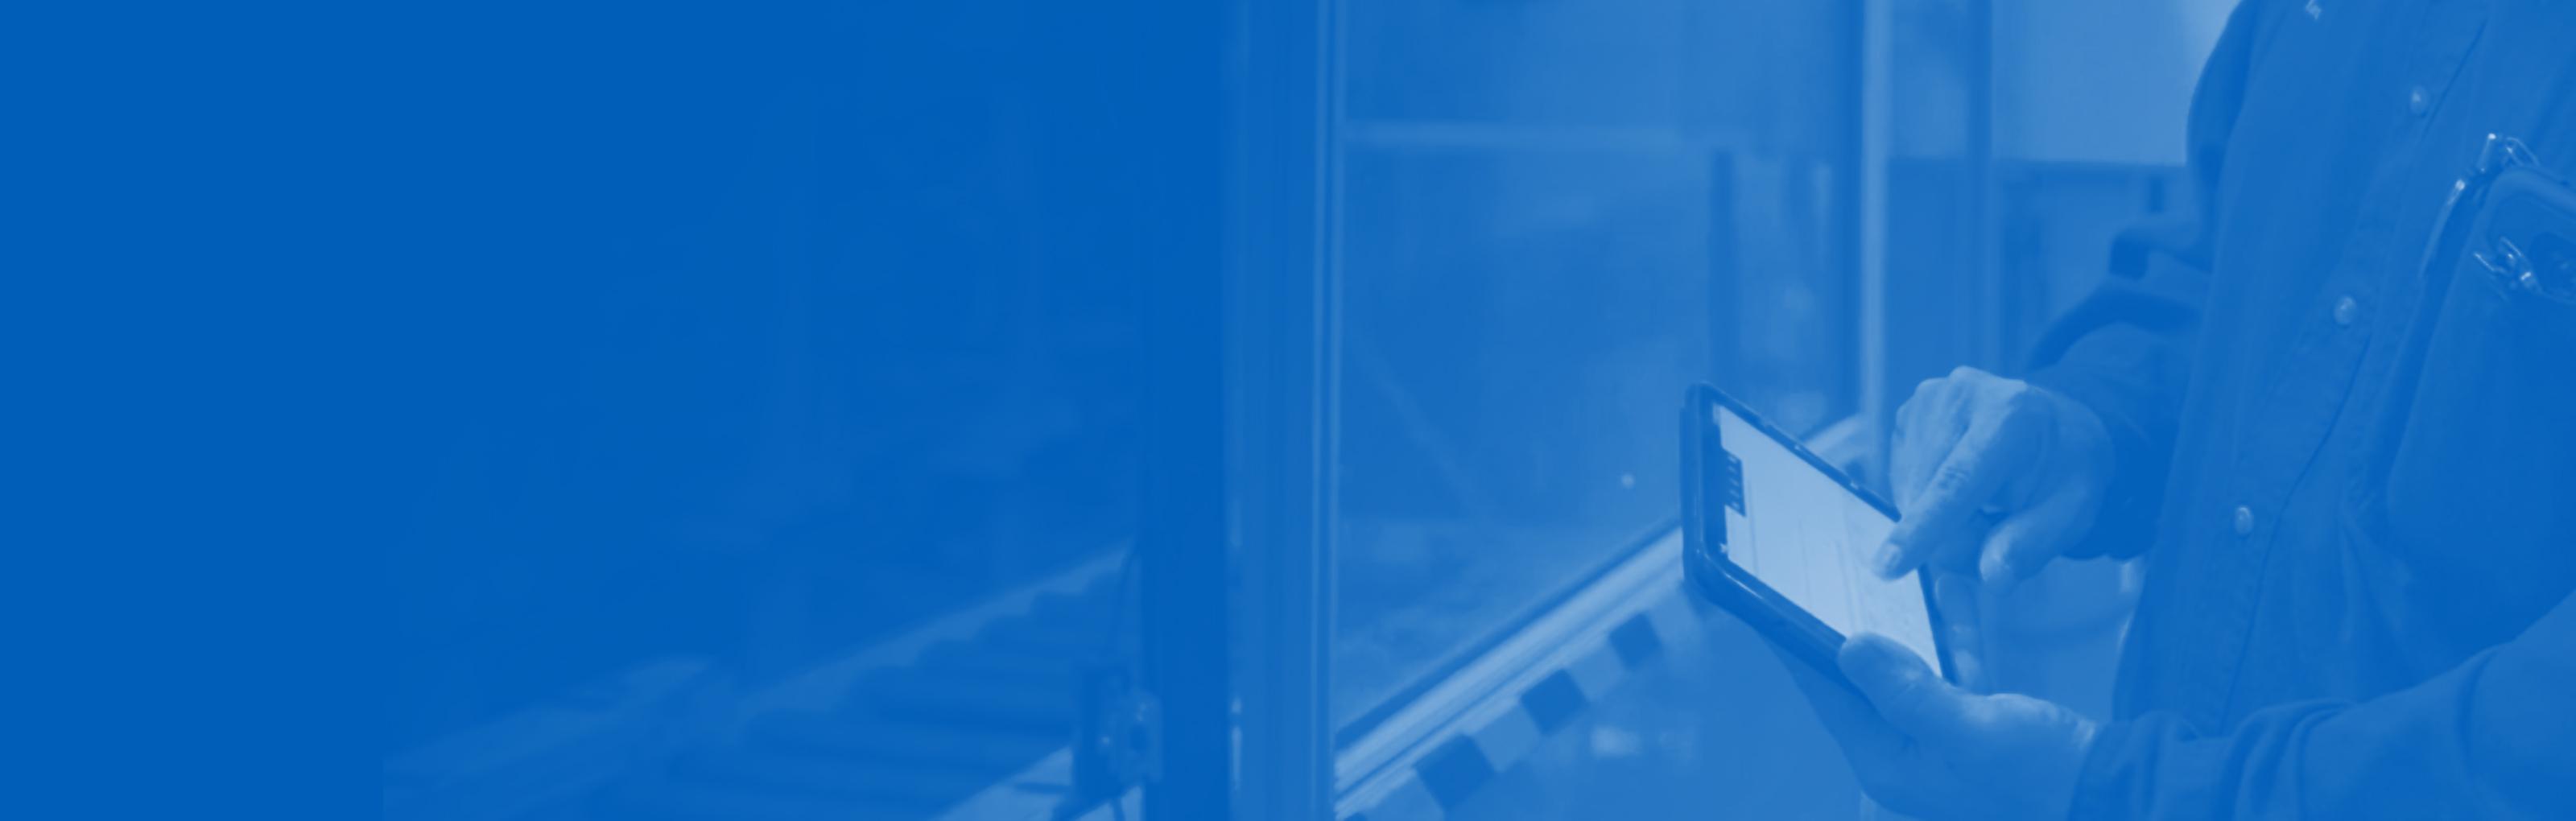 CIMPLICITY | HMI and SCADA | GE Digital